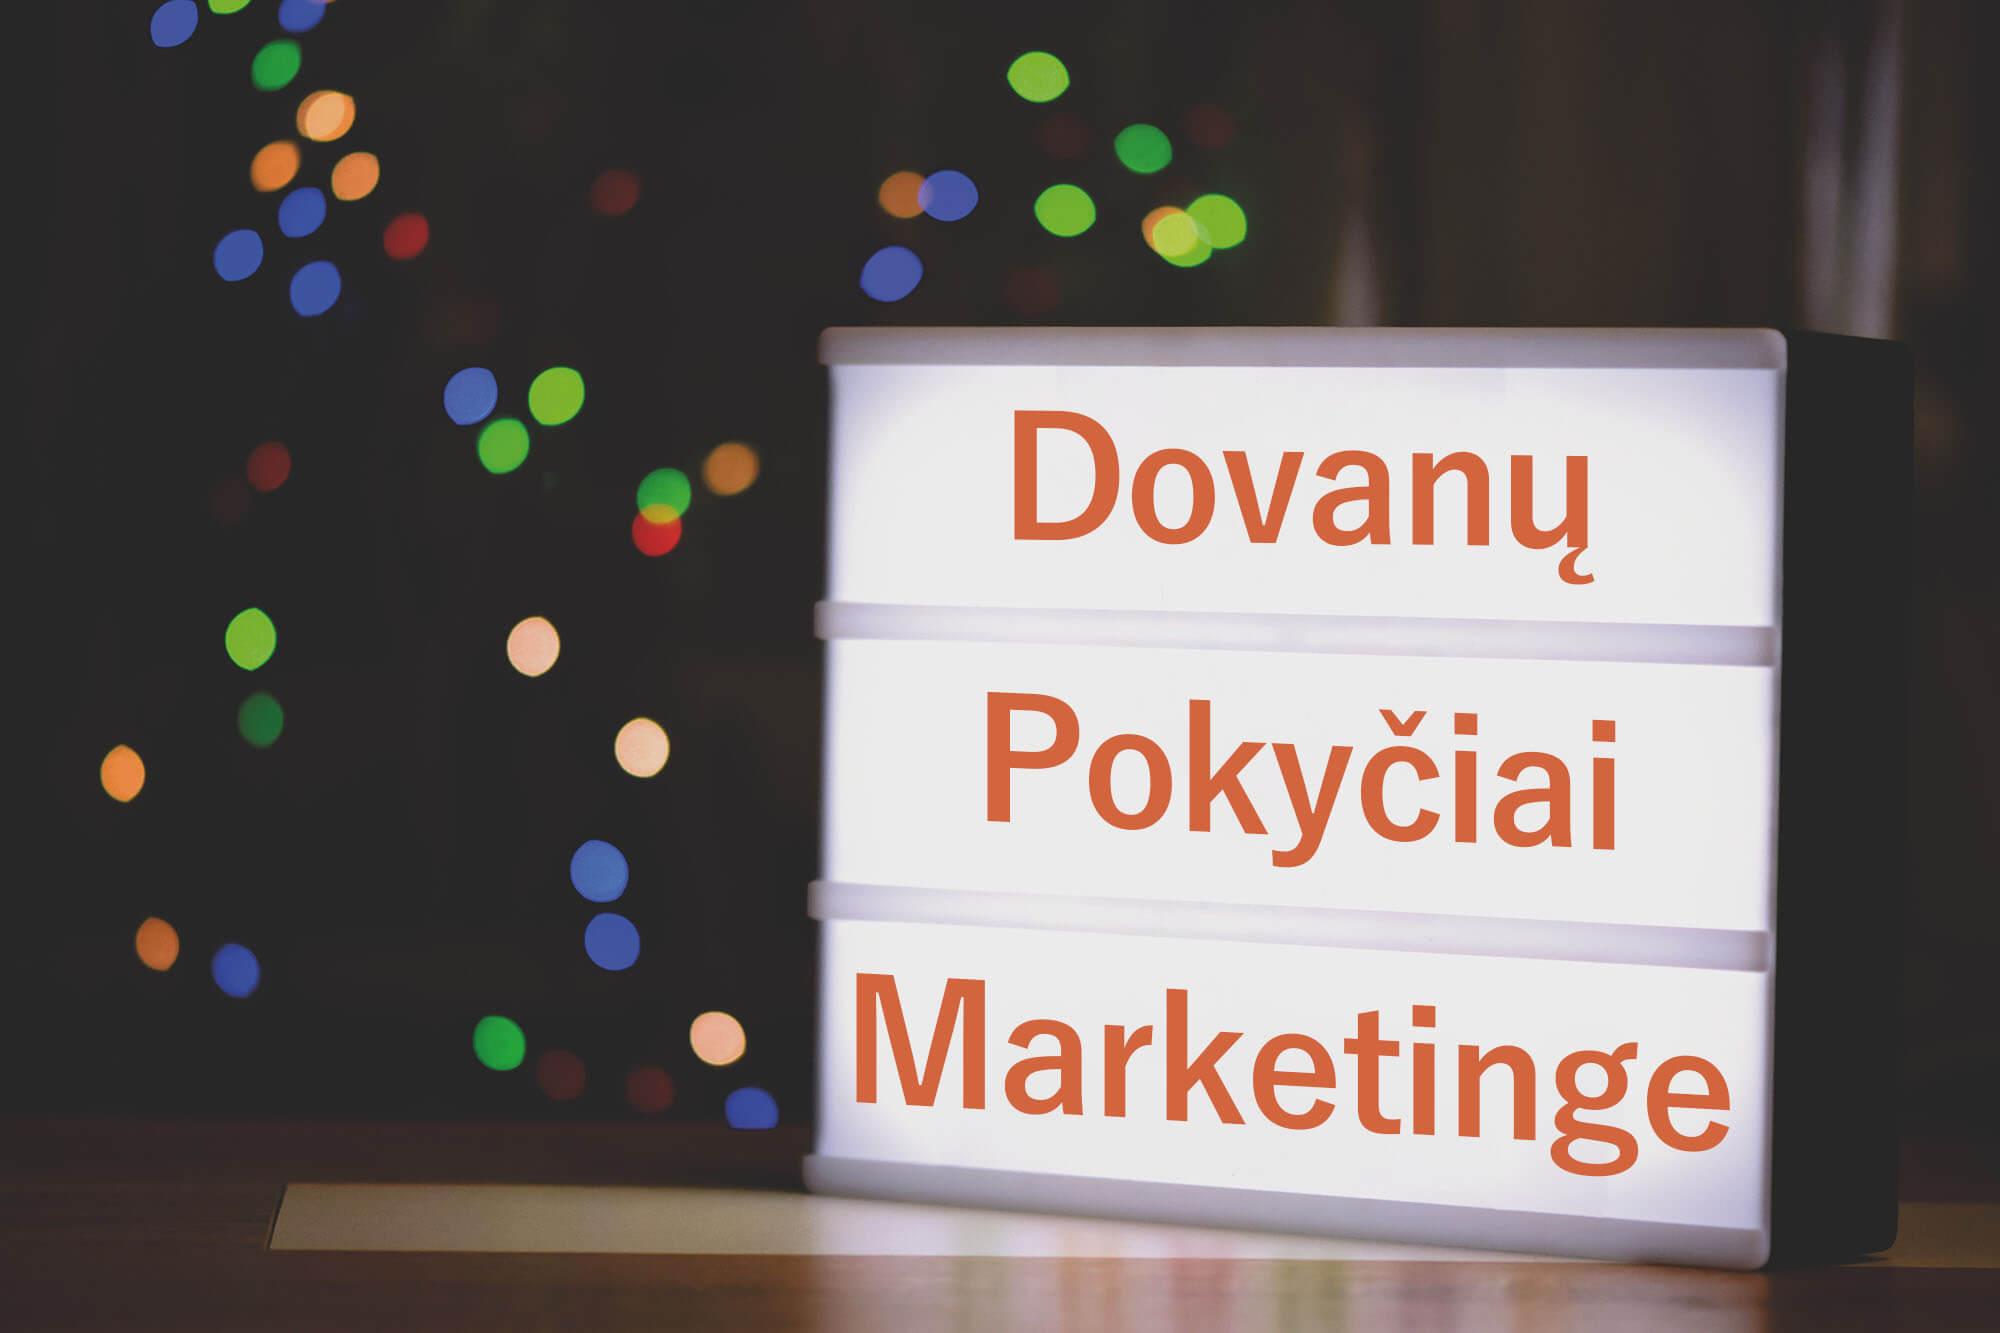 Dovanu-Pokyciai-Marketinge-Multidora